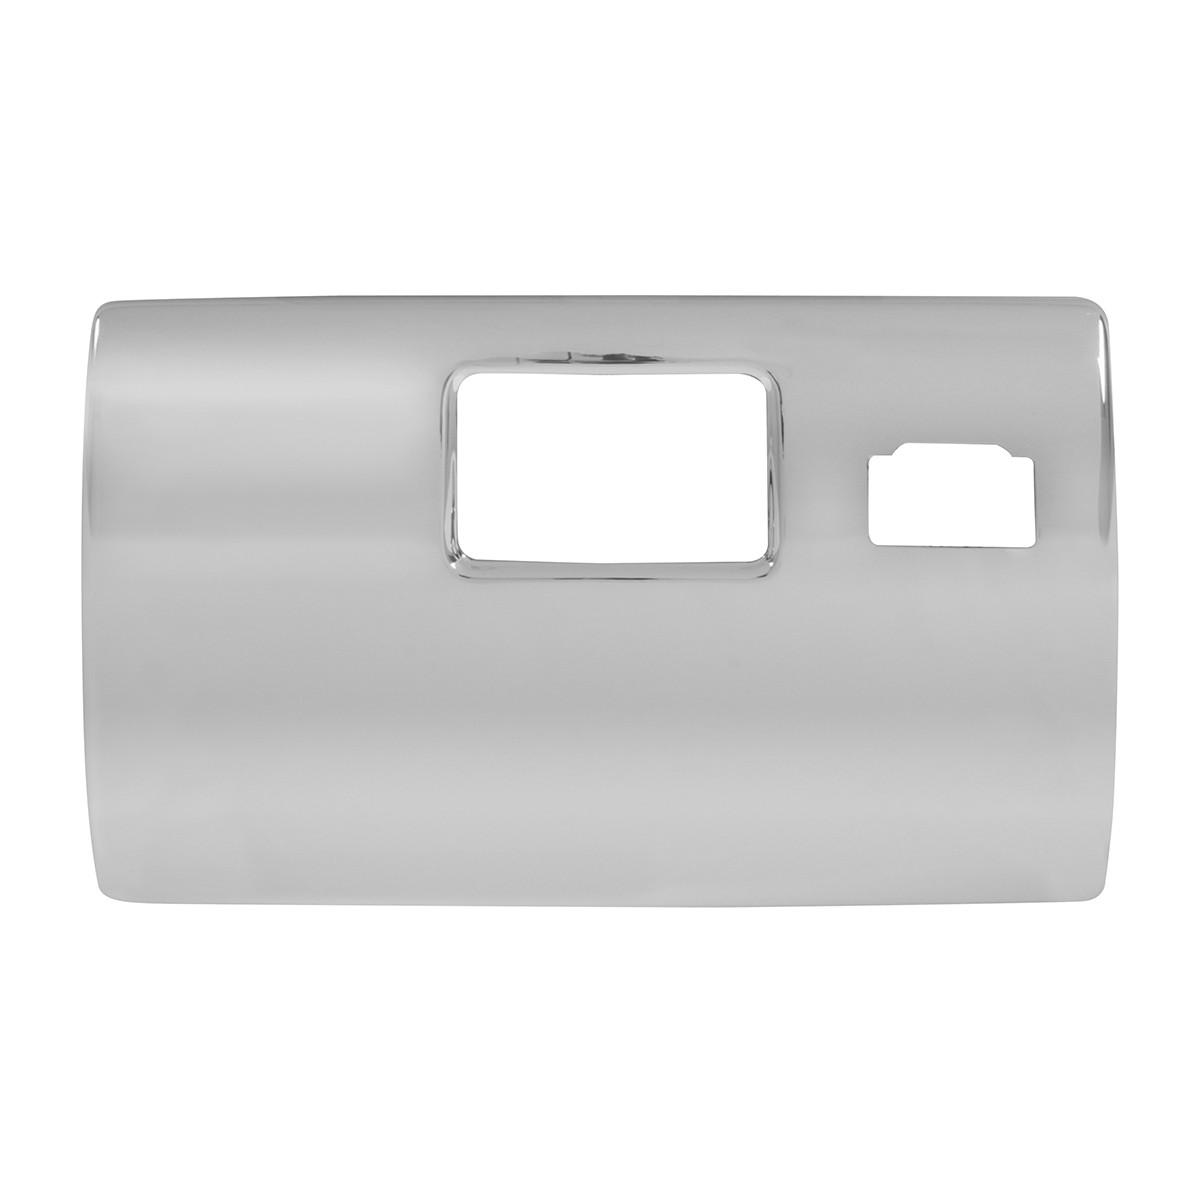 67950 Glove Box Trim w/ Emblem Hole for Peterbilt 370 Series 2000 to 2005